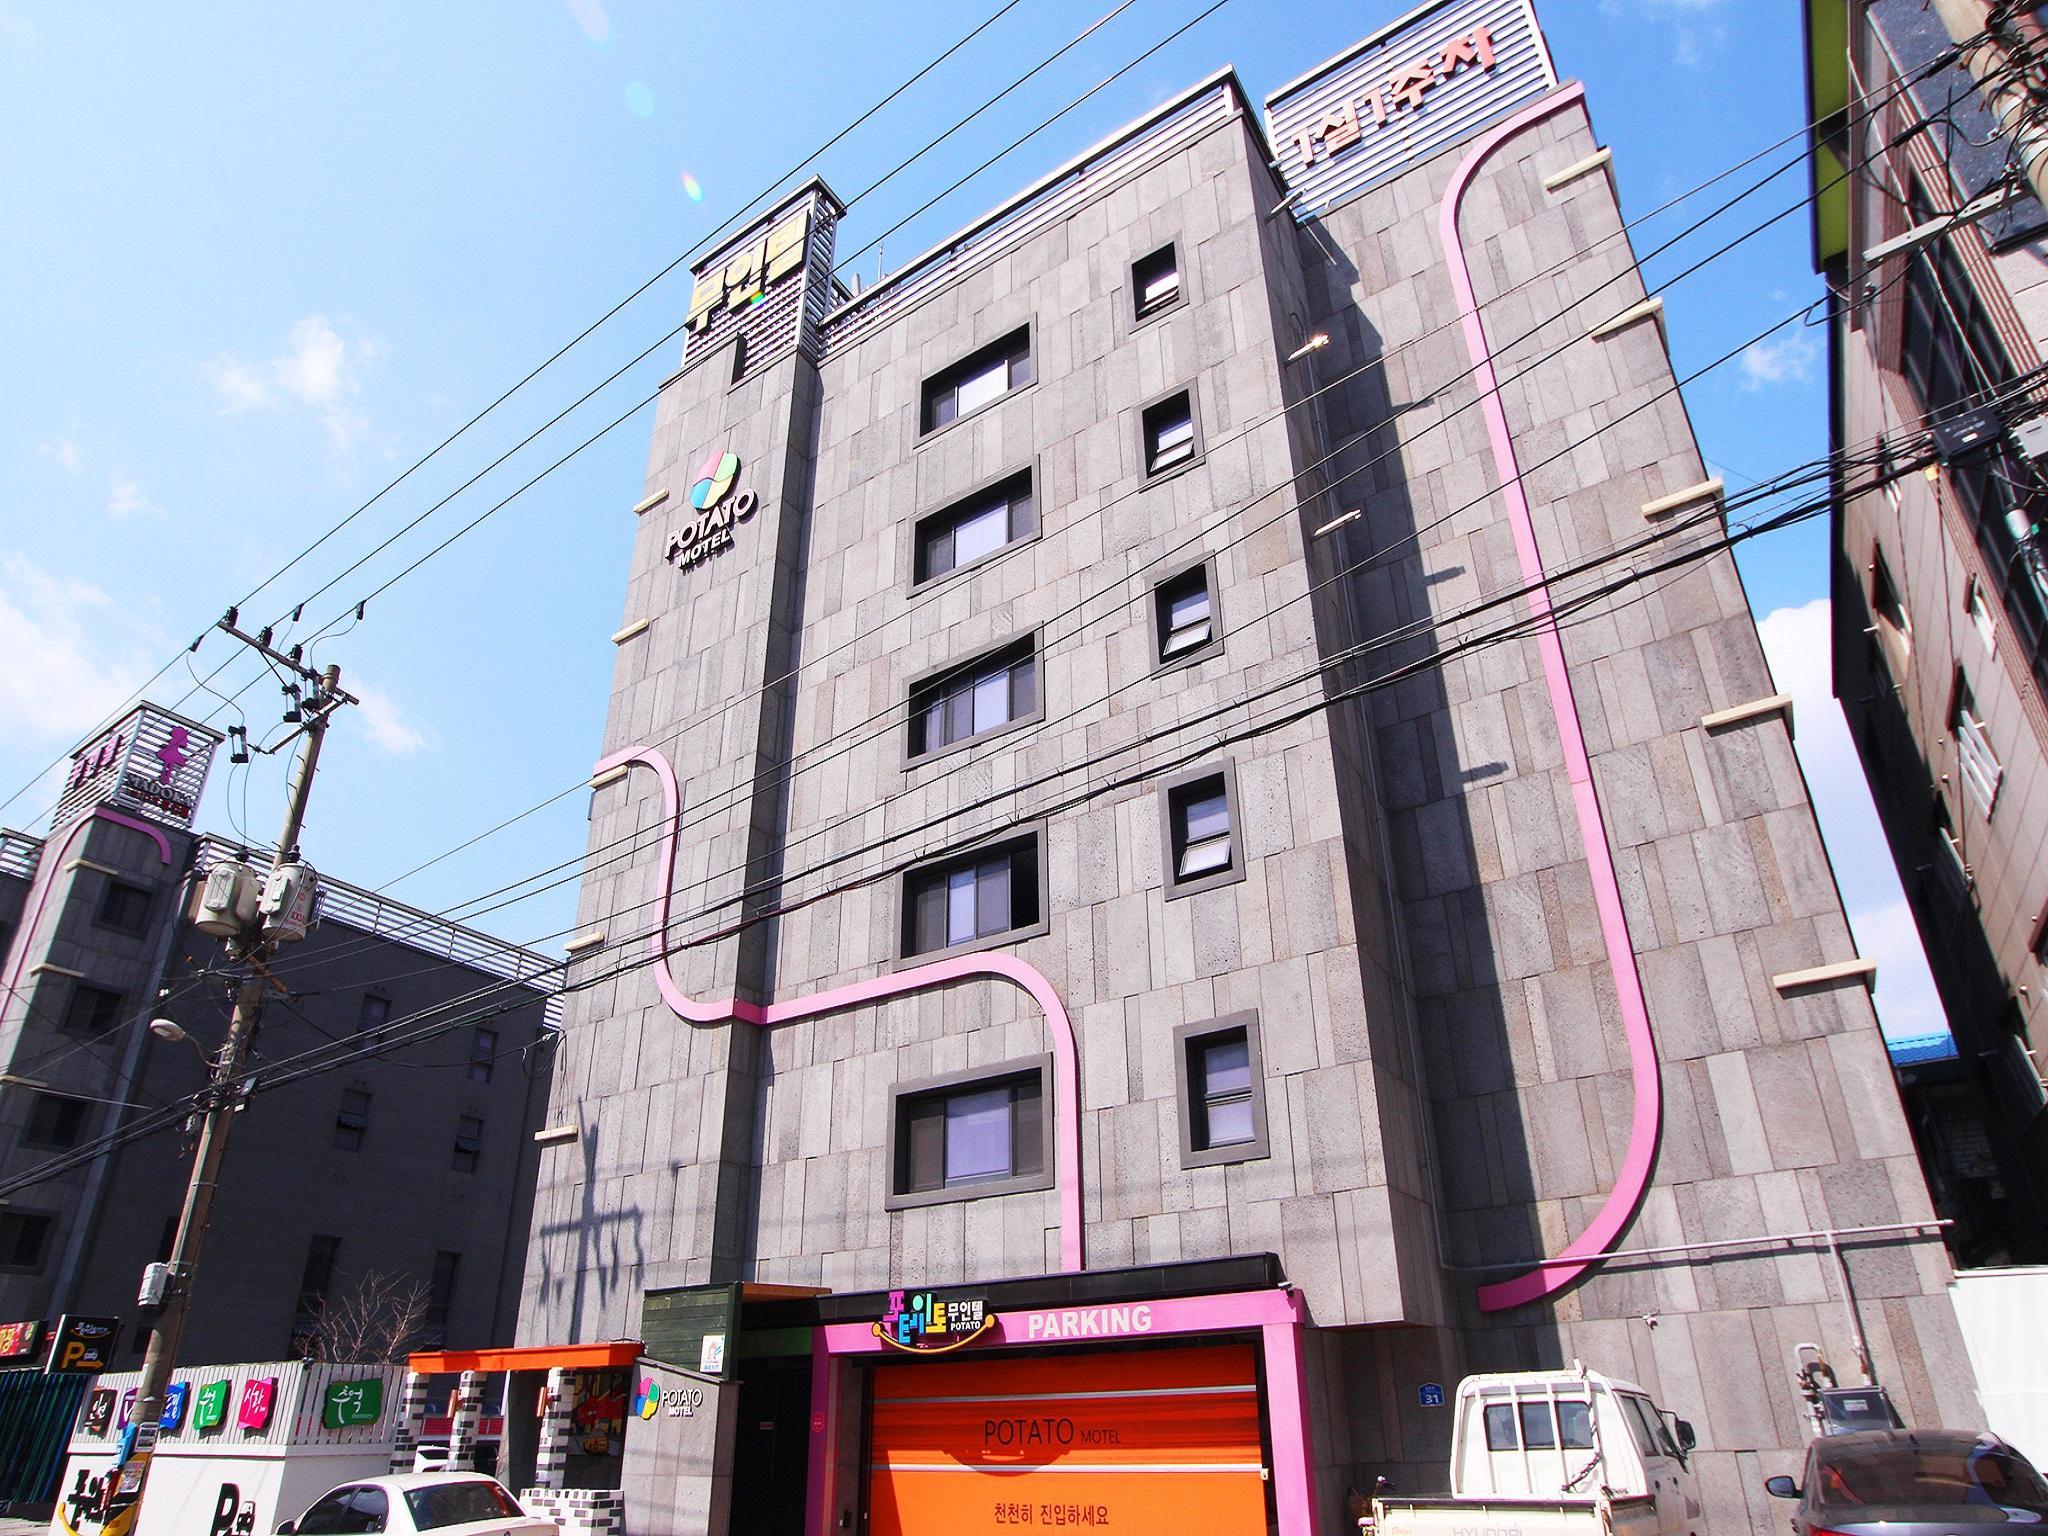 Potato Motel